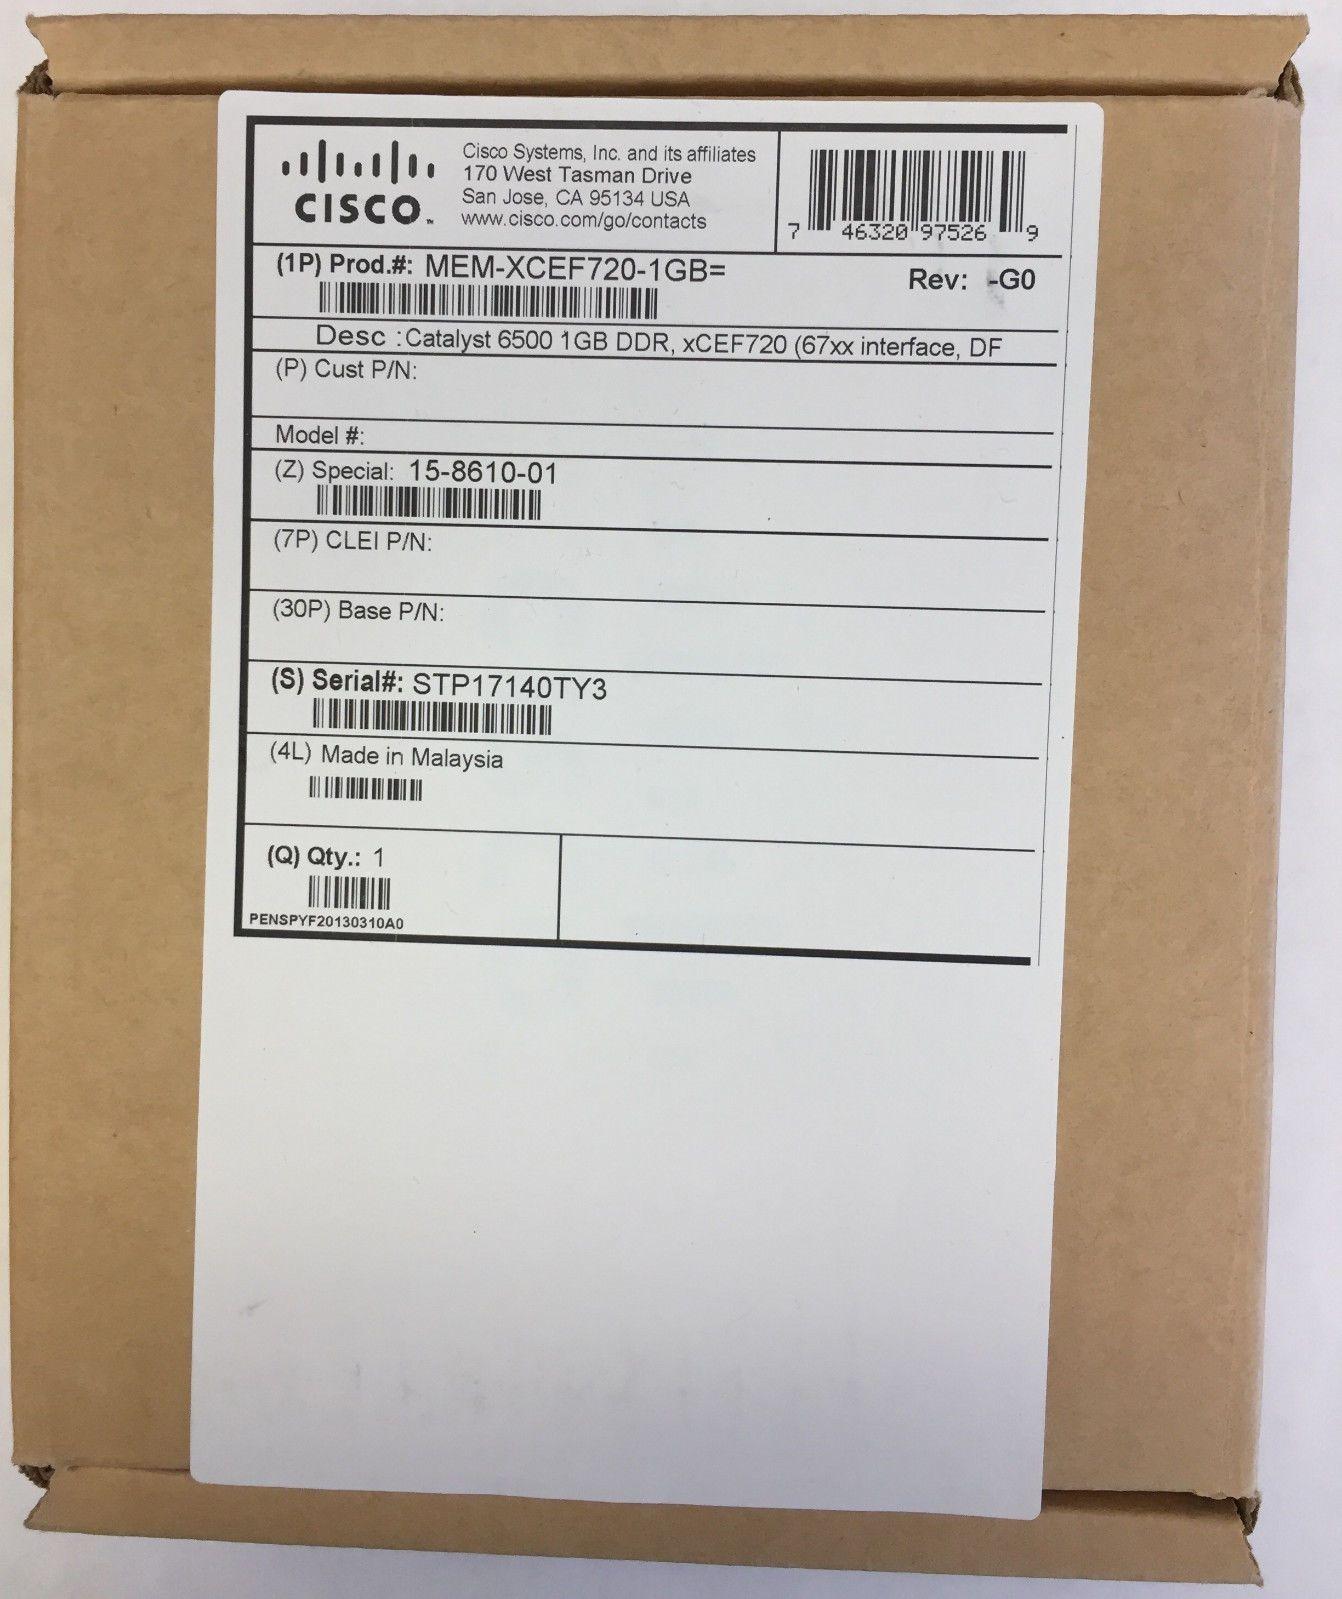 Router Memory 67292: Mem-Xcef720-1Gb Genuine 1Gb Memory For